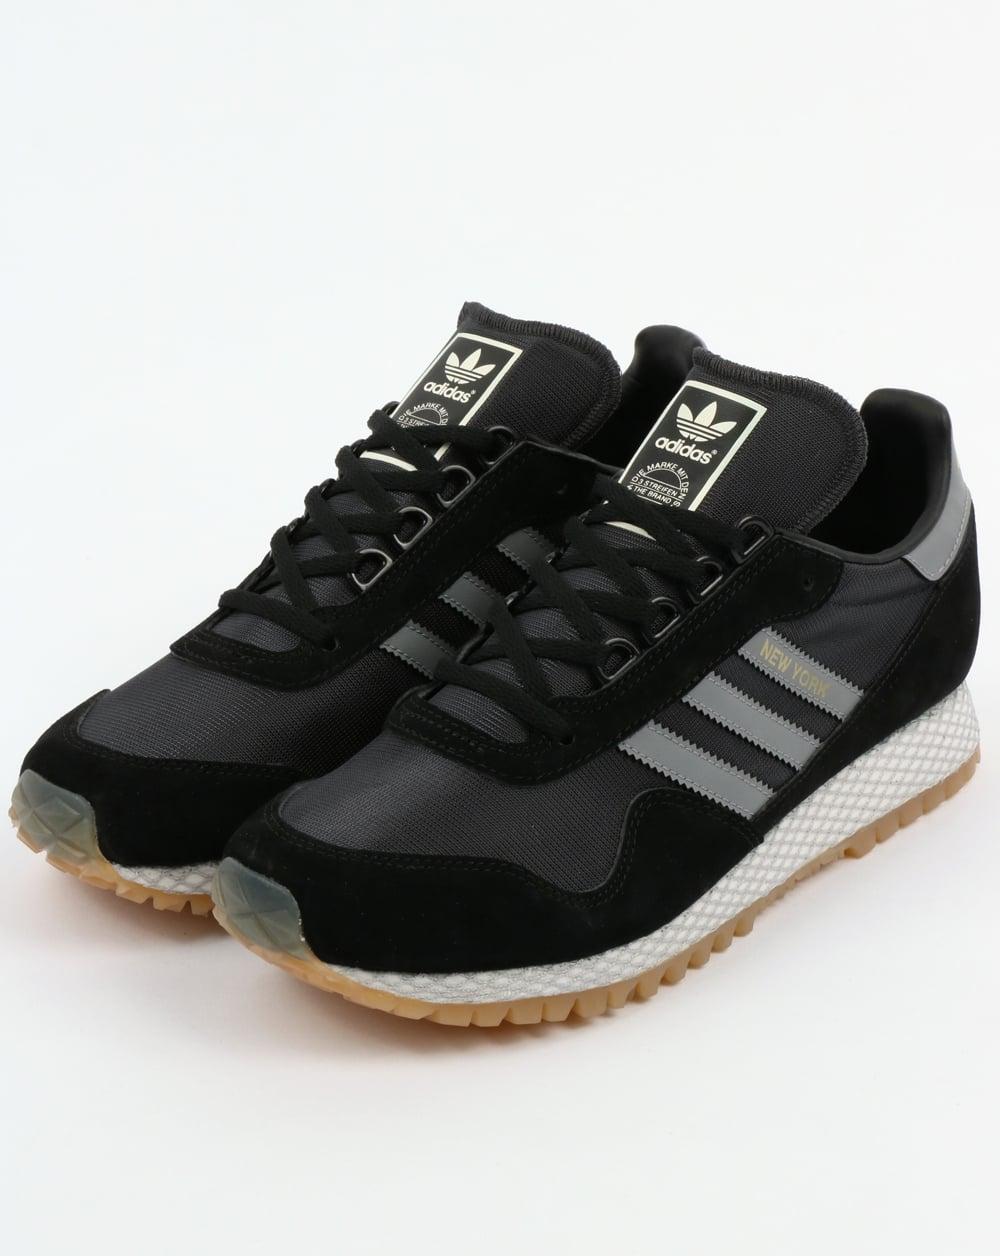 Nombre provisional Correa Centro de la ciudad  Adidas New York Trainers Black/Grey | 80s casual classics